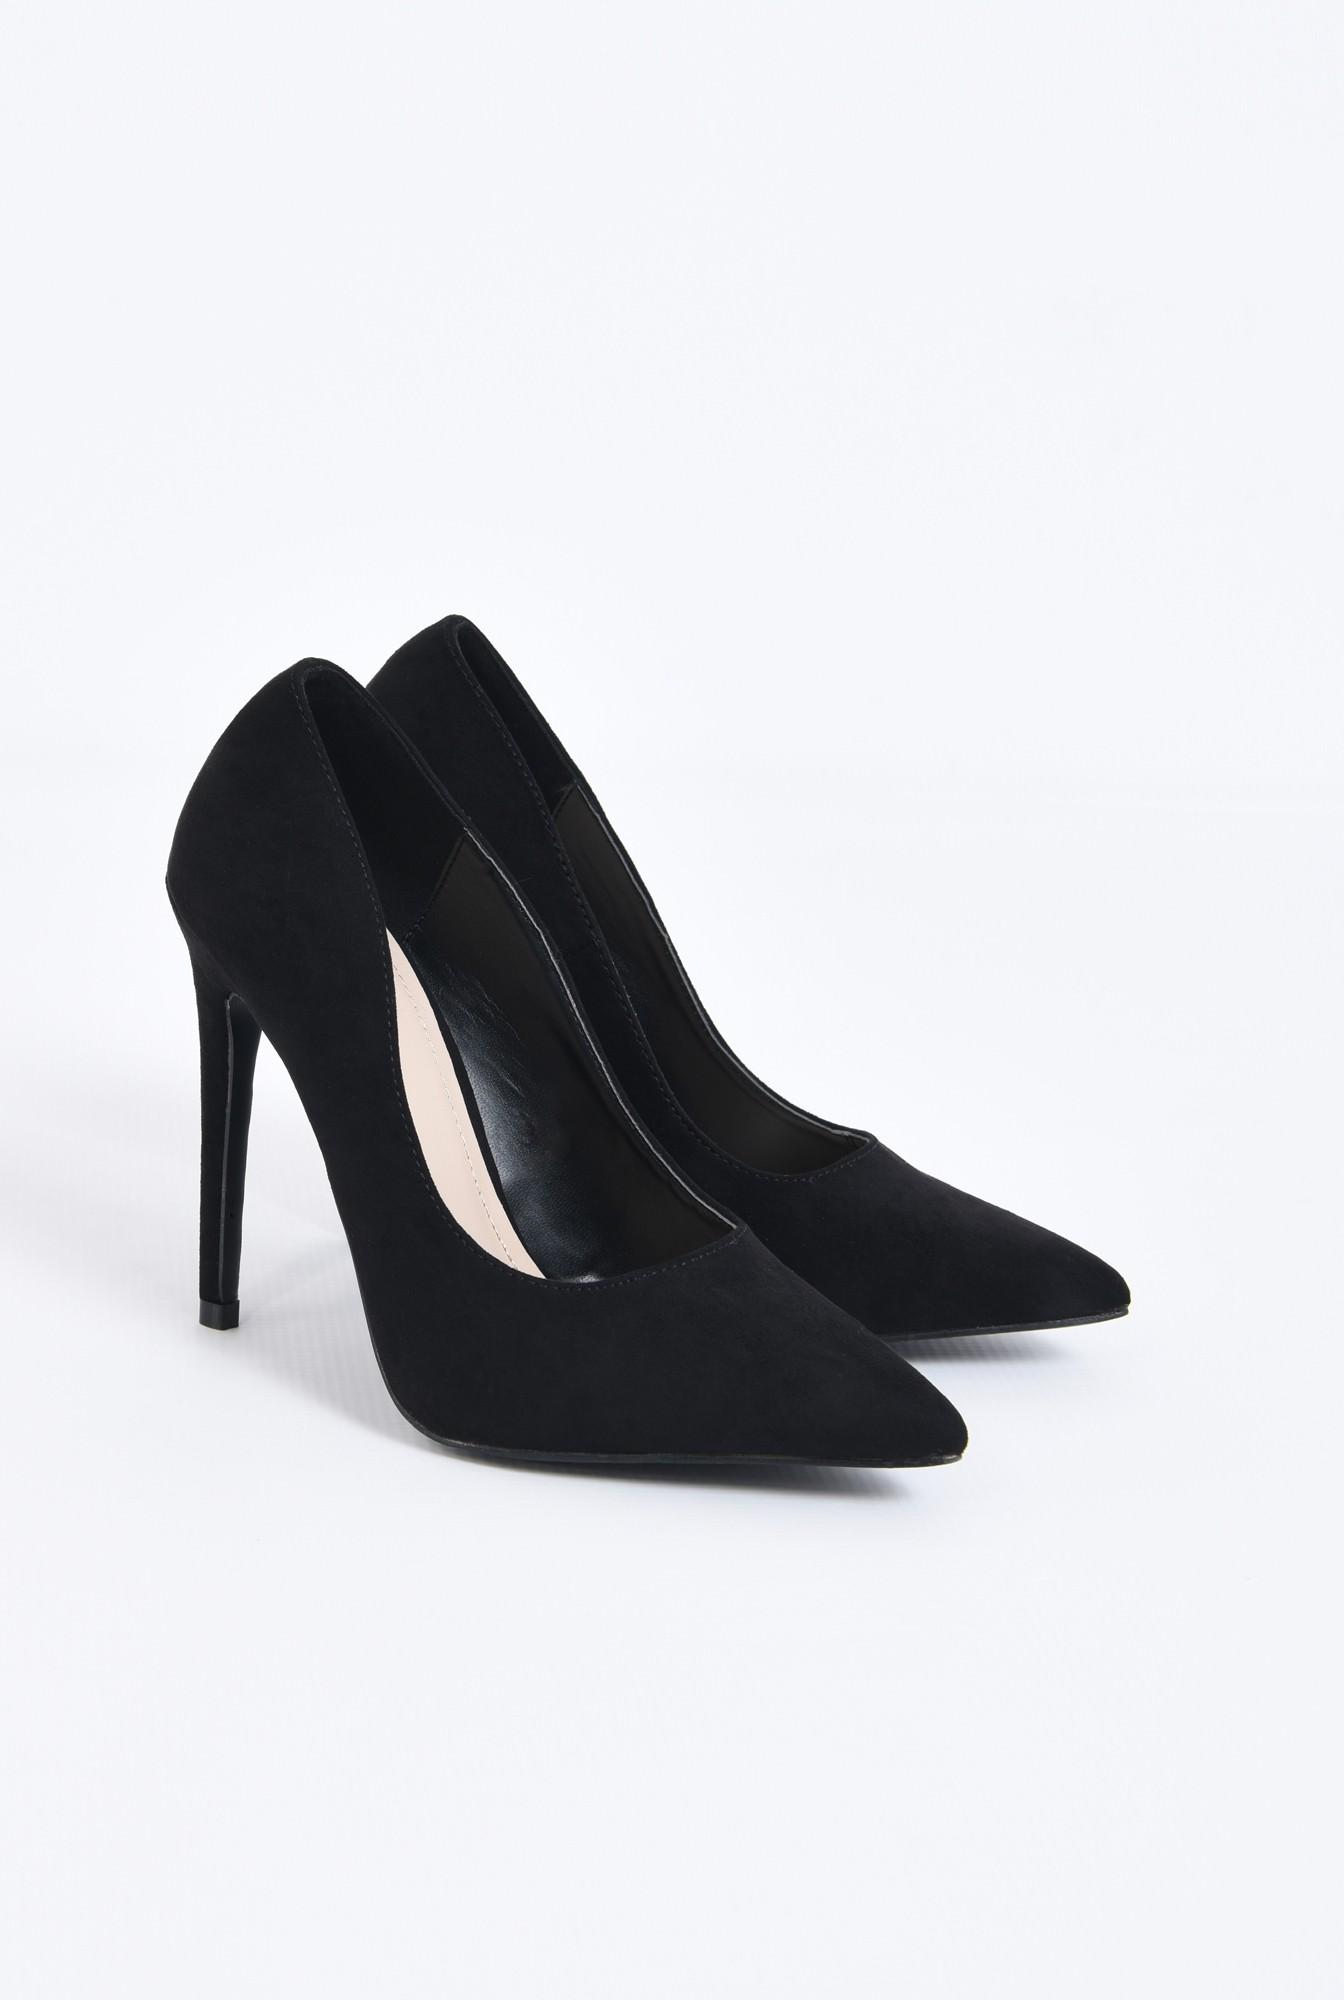 pantofi de ocazie, varf ascutit, toc inalt